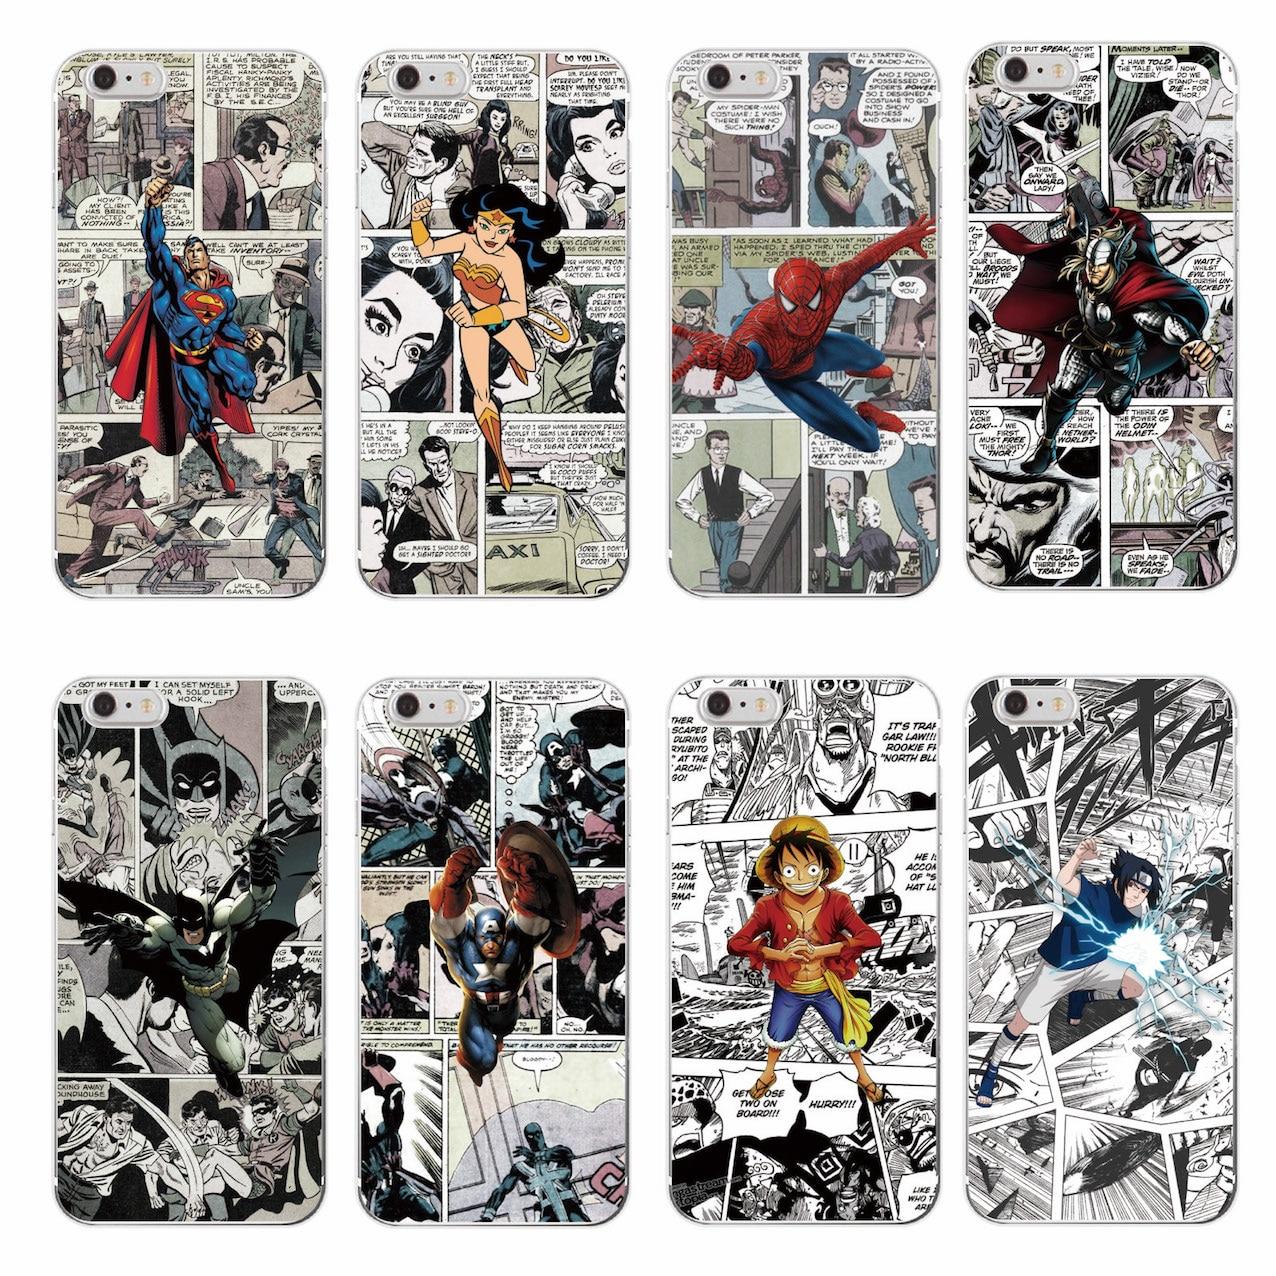 Cartoons Marvel <font><b>Comics</b></font> Batman <font><b>Spider</b></font> <font><b>Man</b></font> Wonder woman Captain America Soft Phone <font><b>Case</b></font> <font><b>For</b></font> iPhone 7 7Plus 6 6S 6Plus 5 5S SE 5C